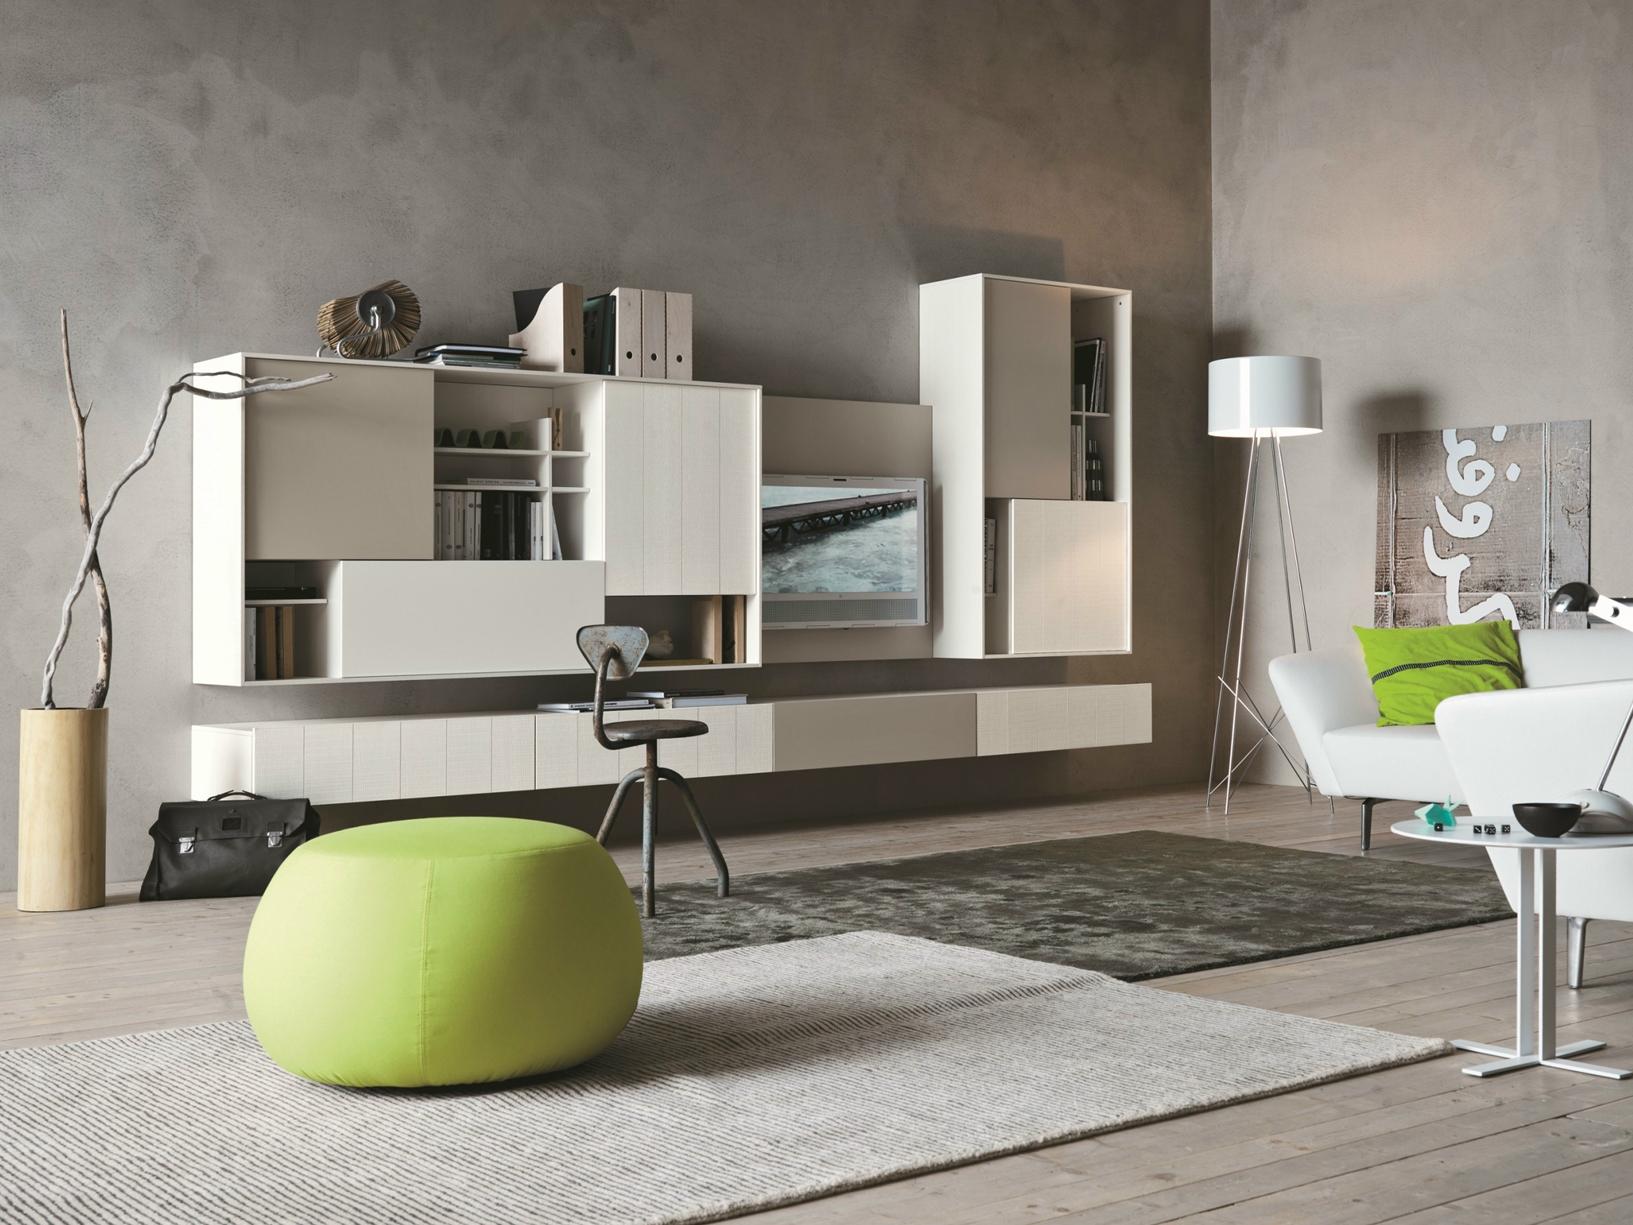 Cucine Torino Prezzi. Affordable Cucina Moderna Mod Futura With ...